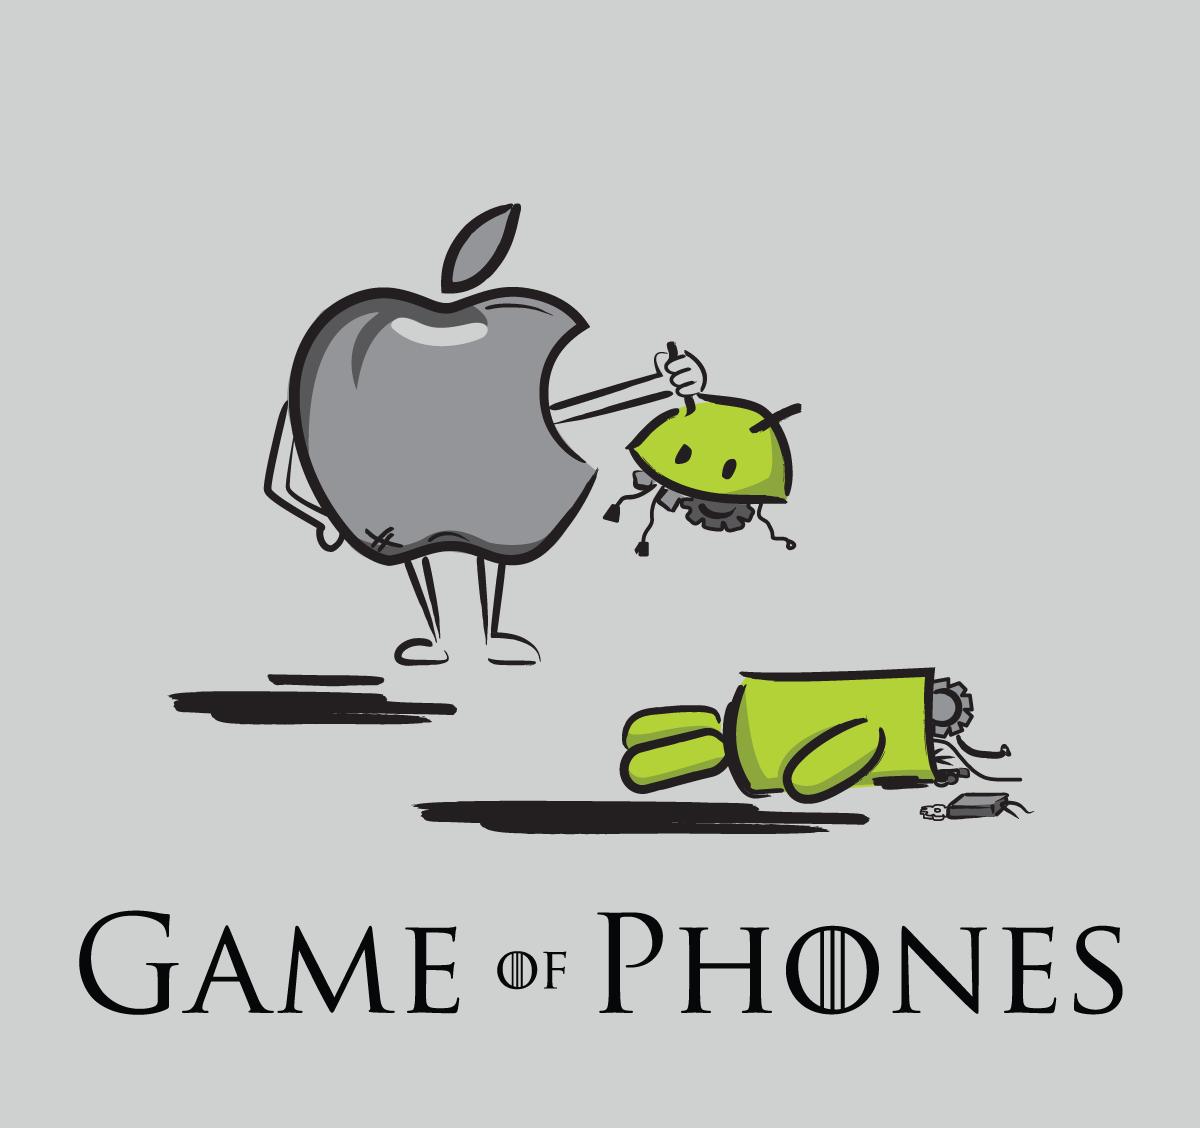 Game of Phones v2